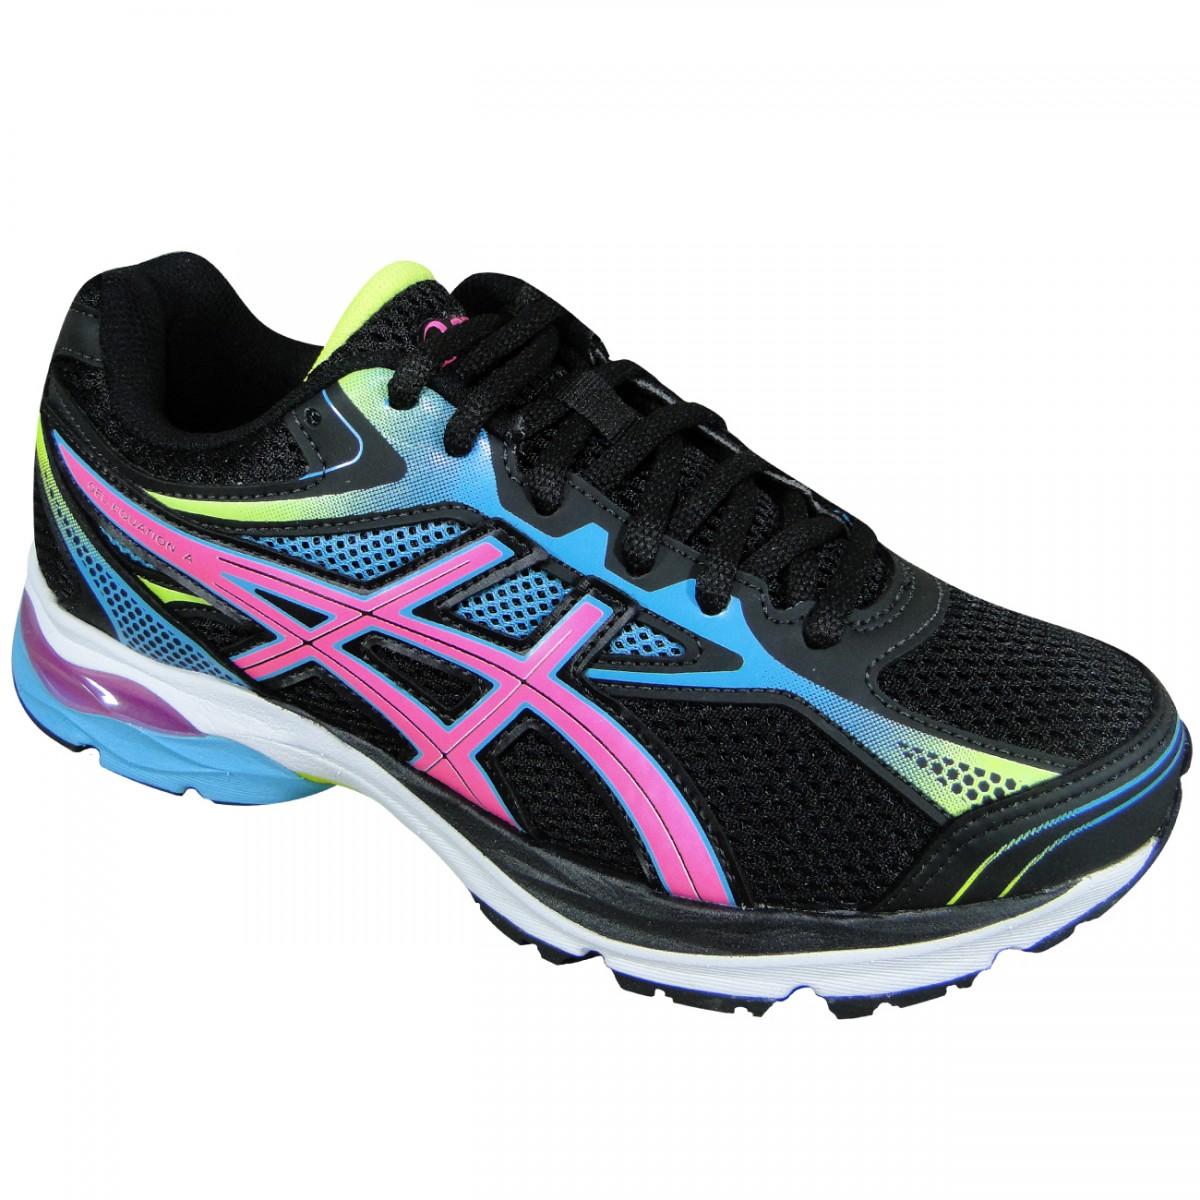 79a2db2557e4b Tenis Asics Gel-Equation 9 T072A 9020 - Preto Azul Rosa - Chuteira Nike